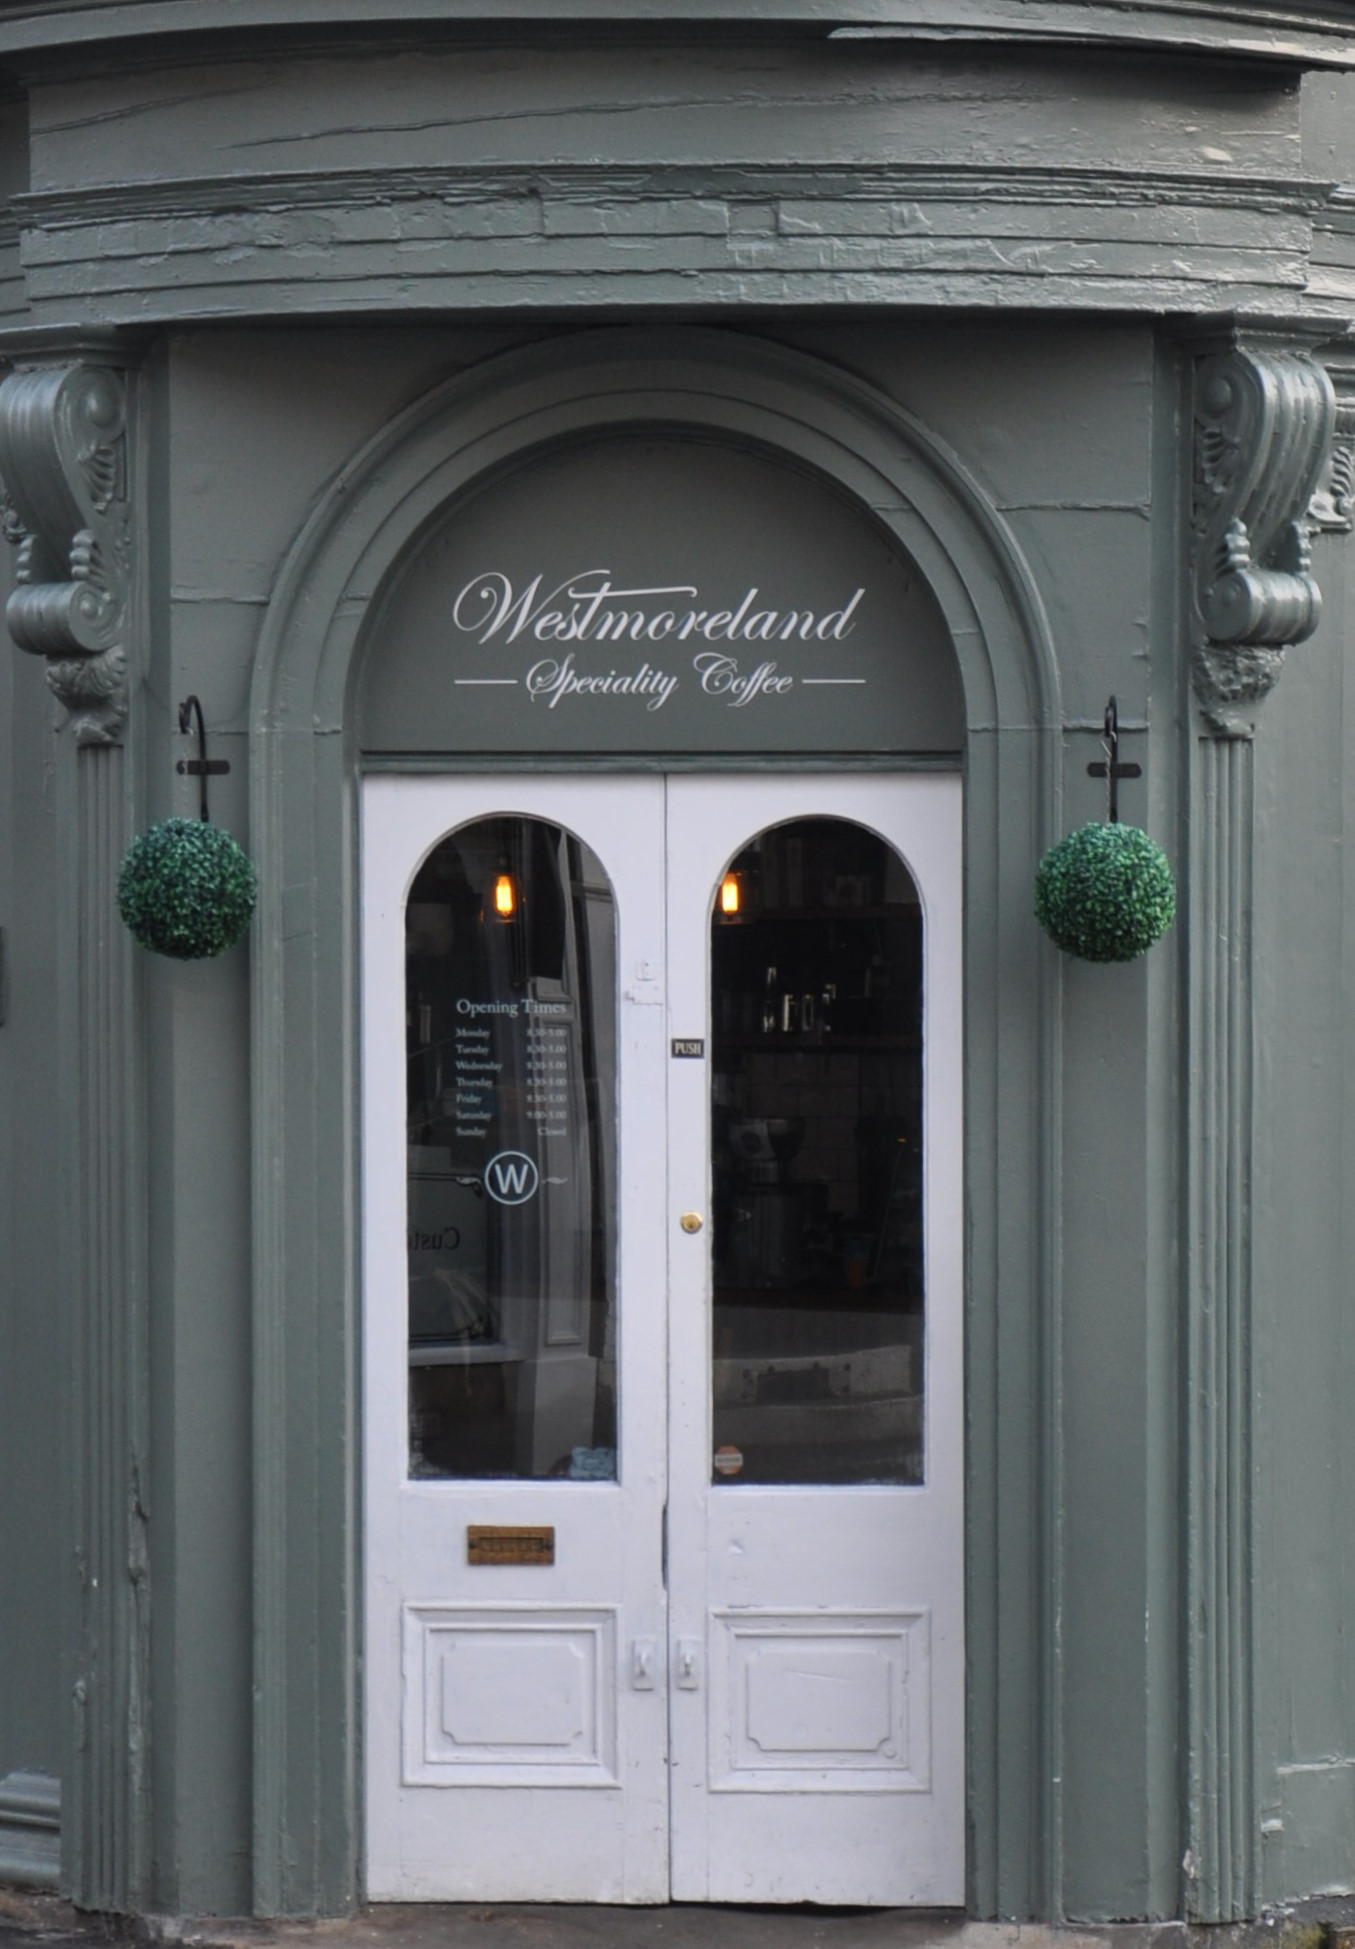 The front door of Westmoreland Coffee on the corner of Westmoreland Road in Harrogate.